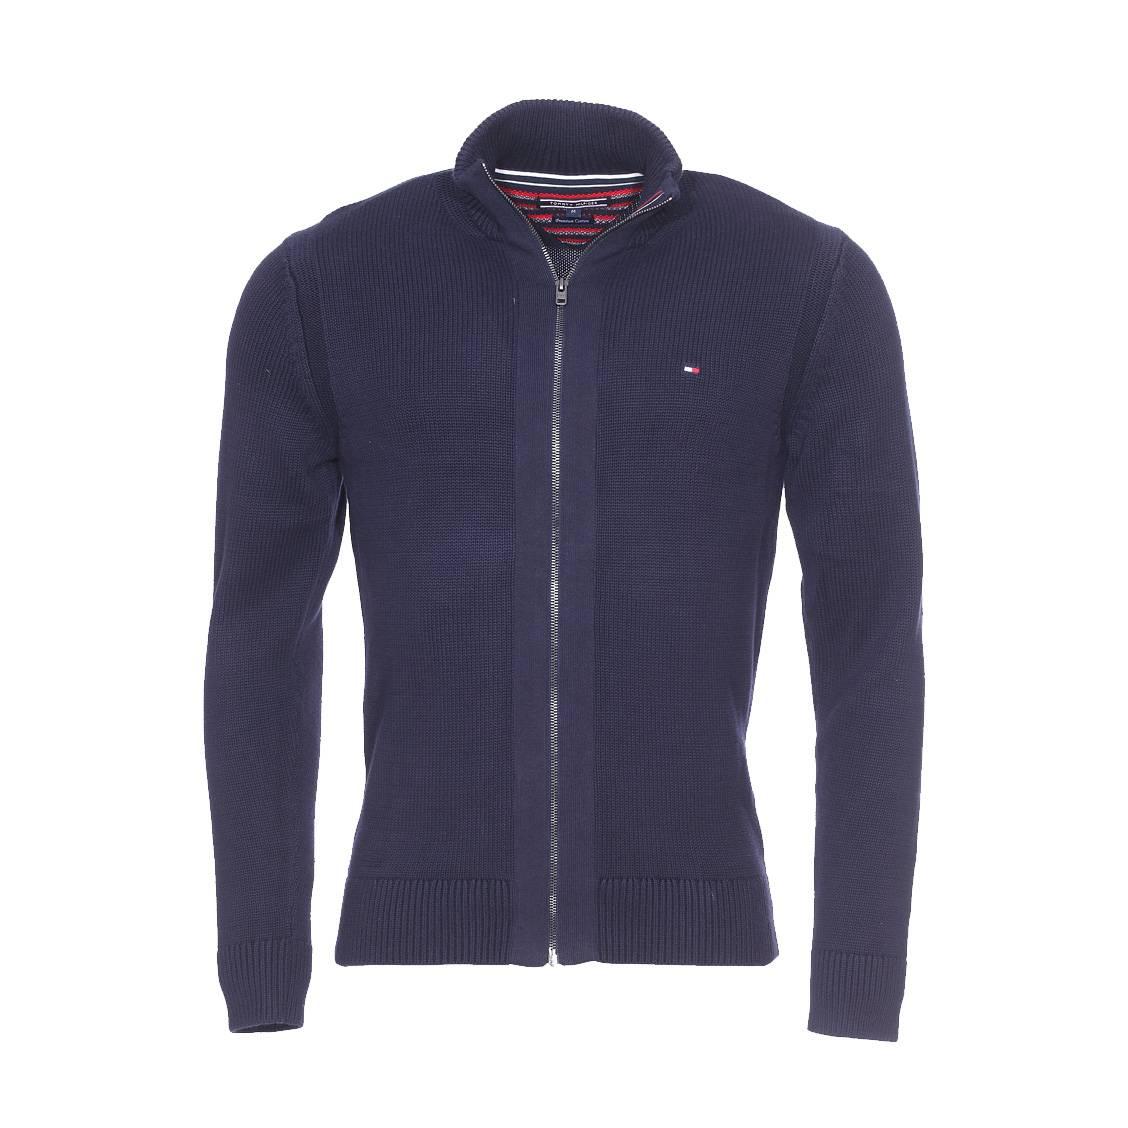 gilet zipp simon tommy hilfiger en mailles tricot es bleu marine rue des hommes. Black Bedroom Furniture Sets. Home Design Ideas